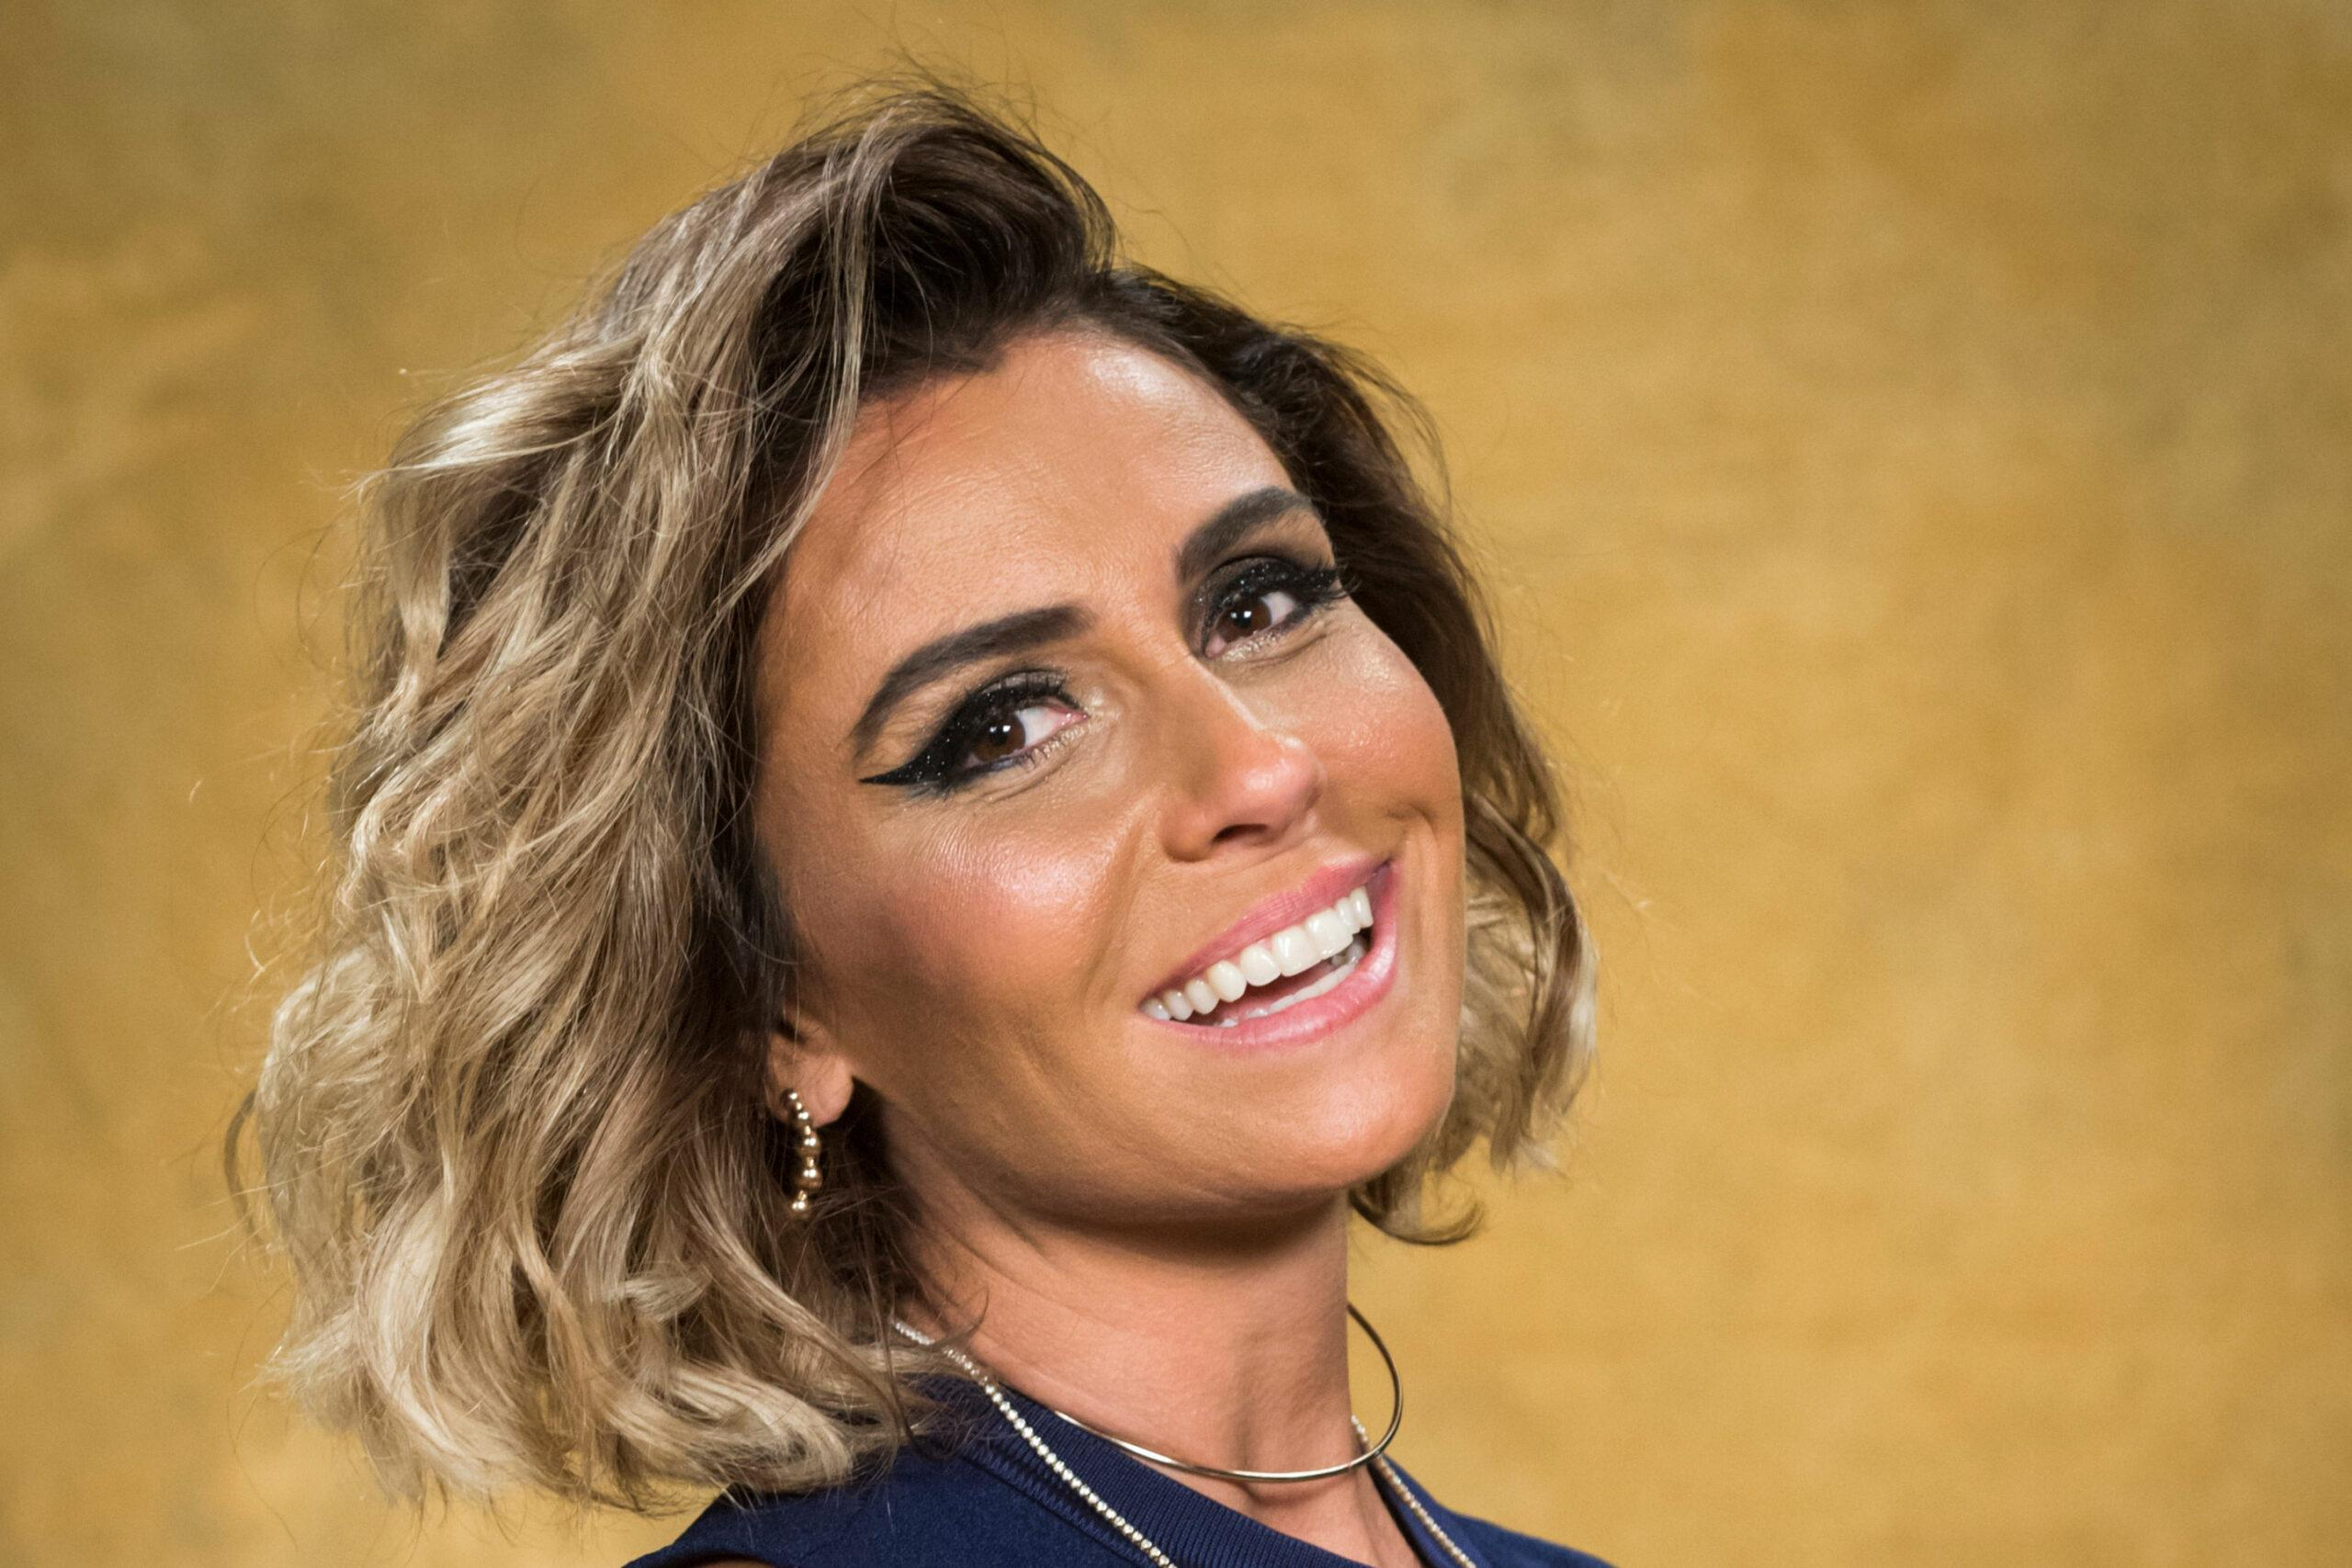 Atriz Giovanna Antonelli tem bens penhorados na justiça